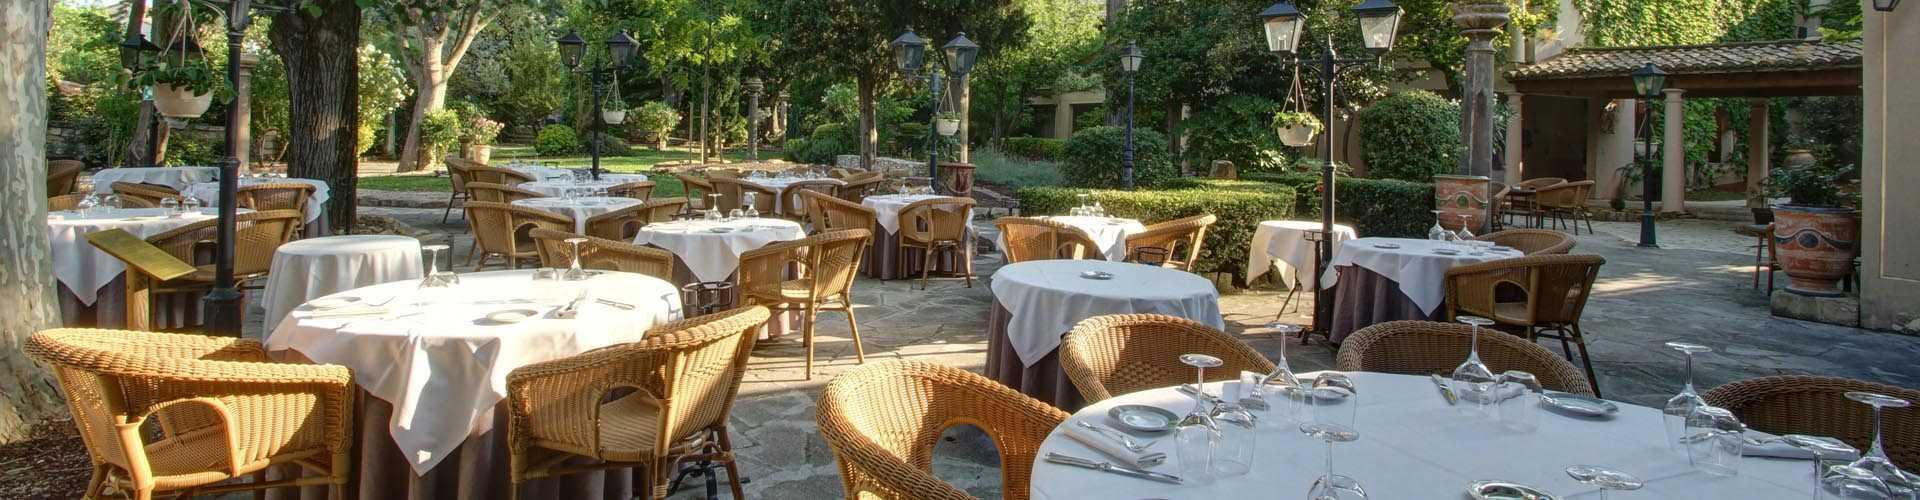 restaurant murier boulogne